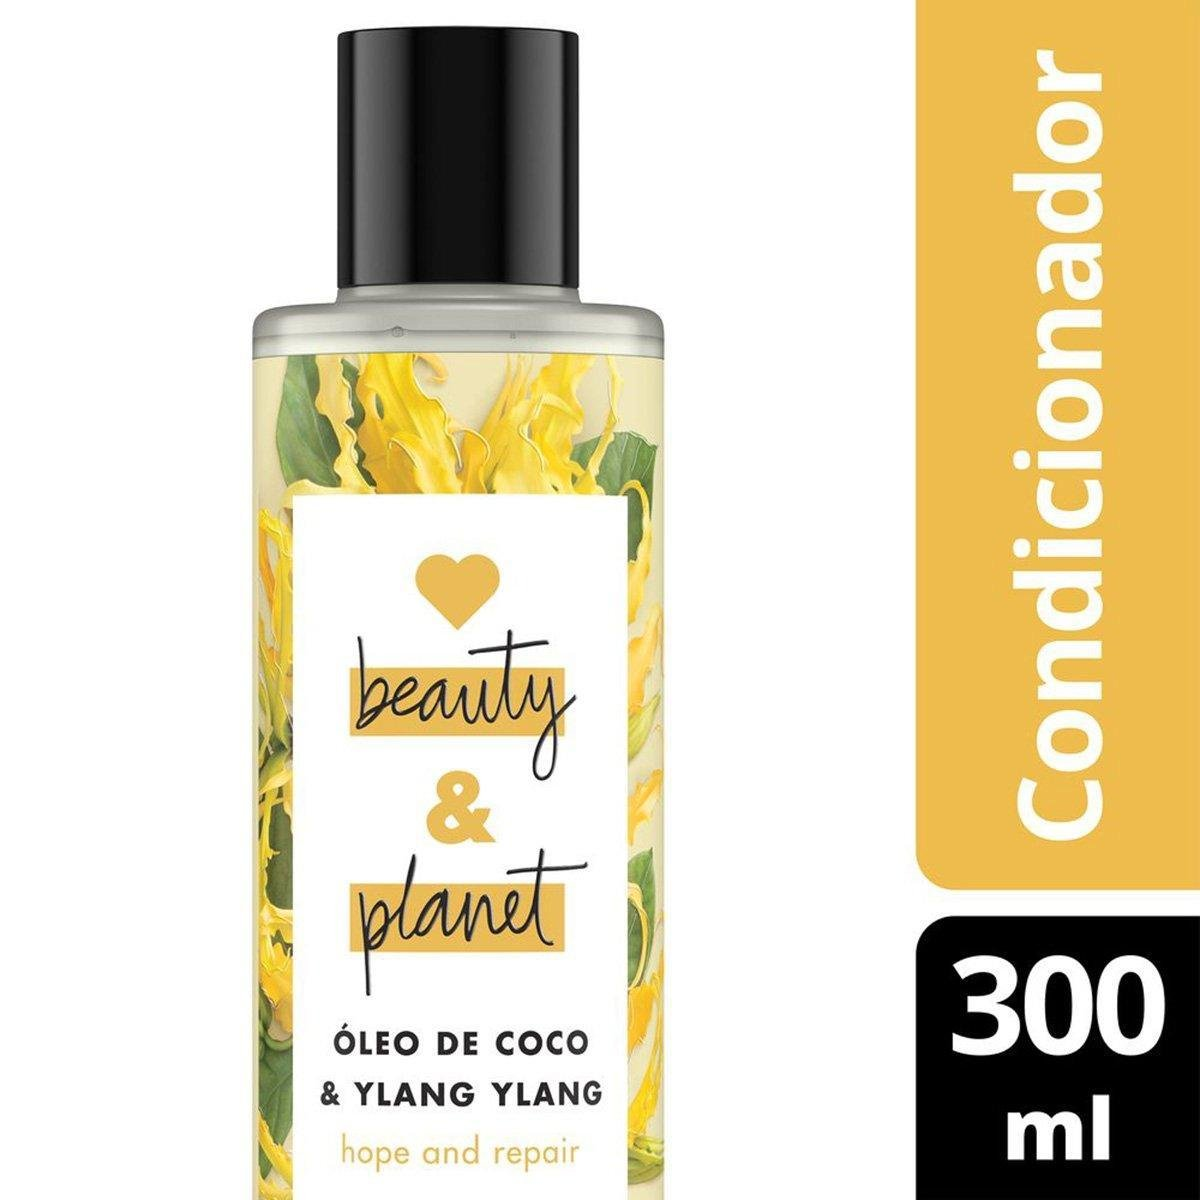 Condicionador Hope and Repair Óleo de Coco & Ylang Ylang Love Beauty and Planet 300ml